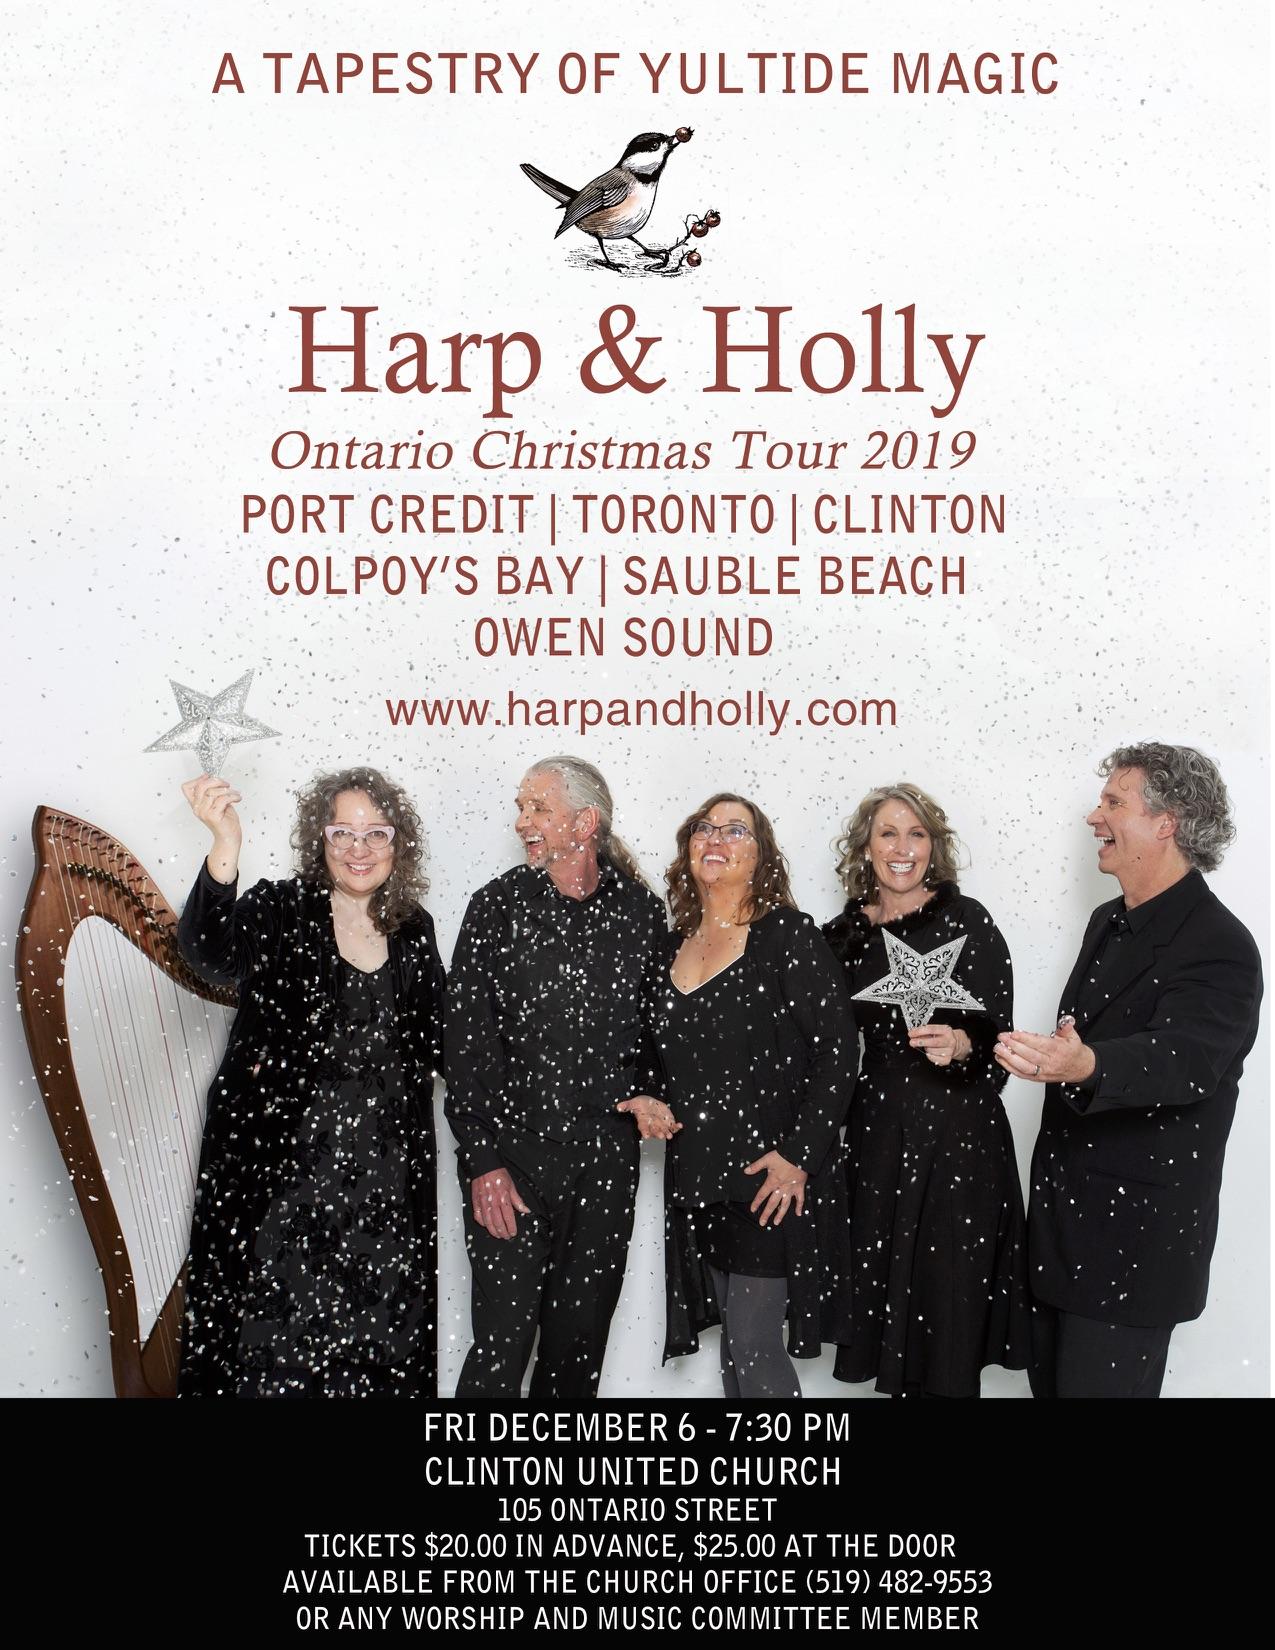 2019 Harp & Holly Poster - CLINTON.jpg